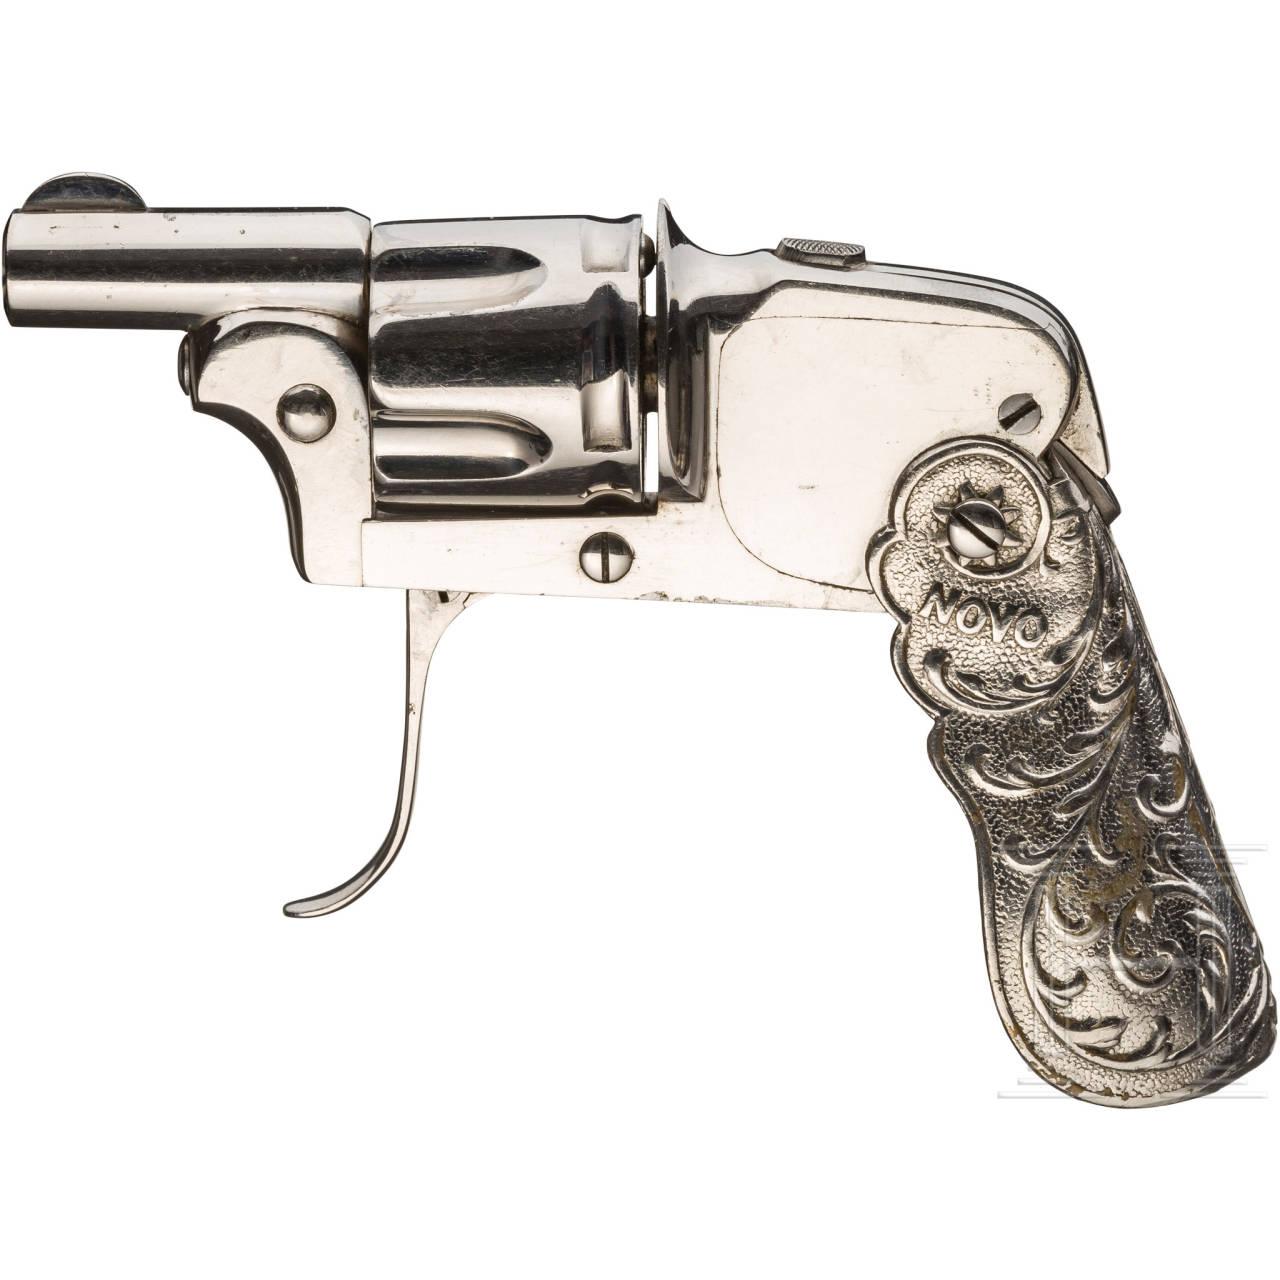 Novo-Revolver, vernickelt